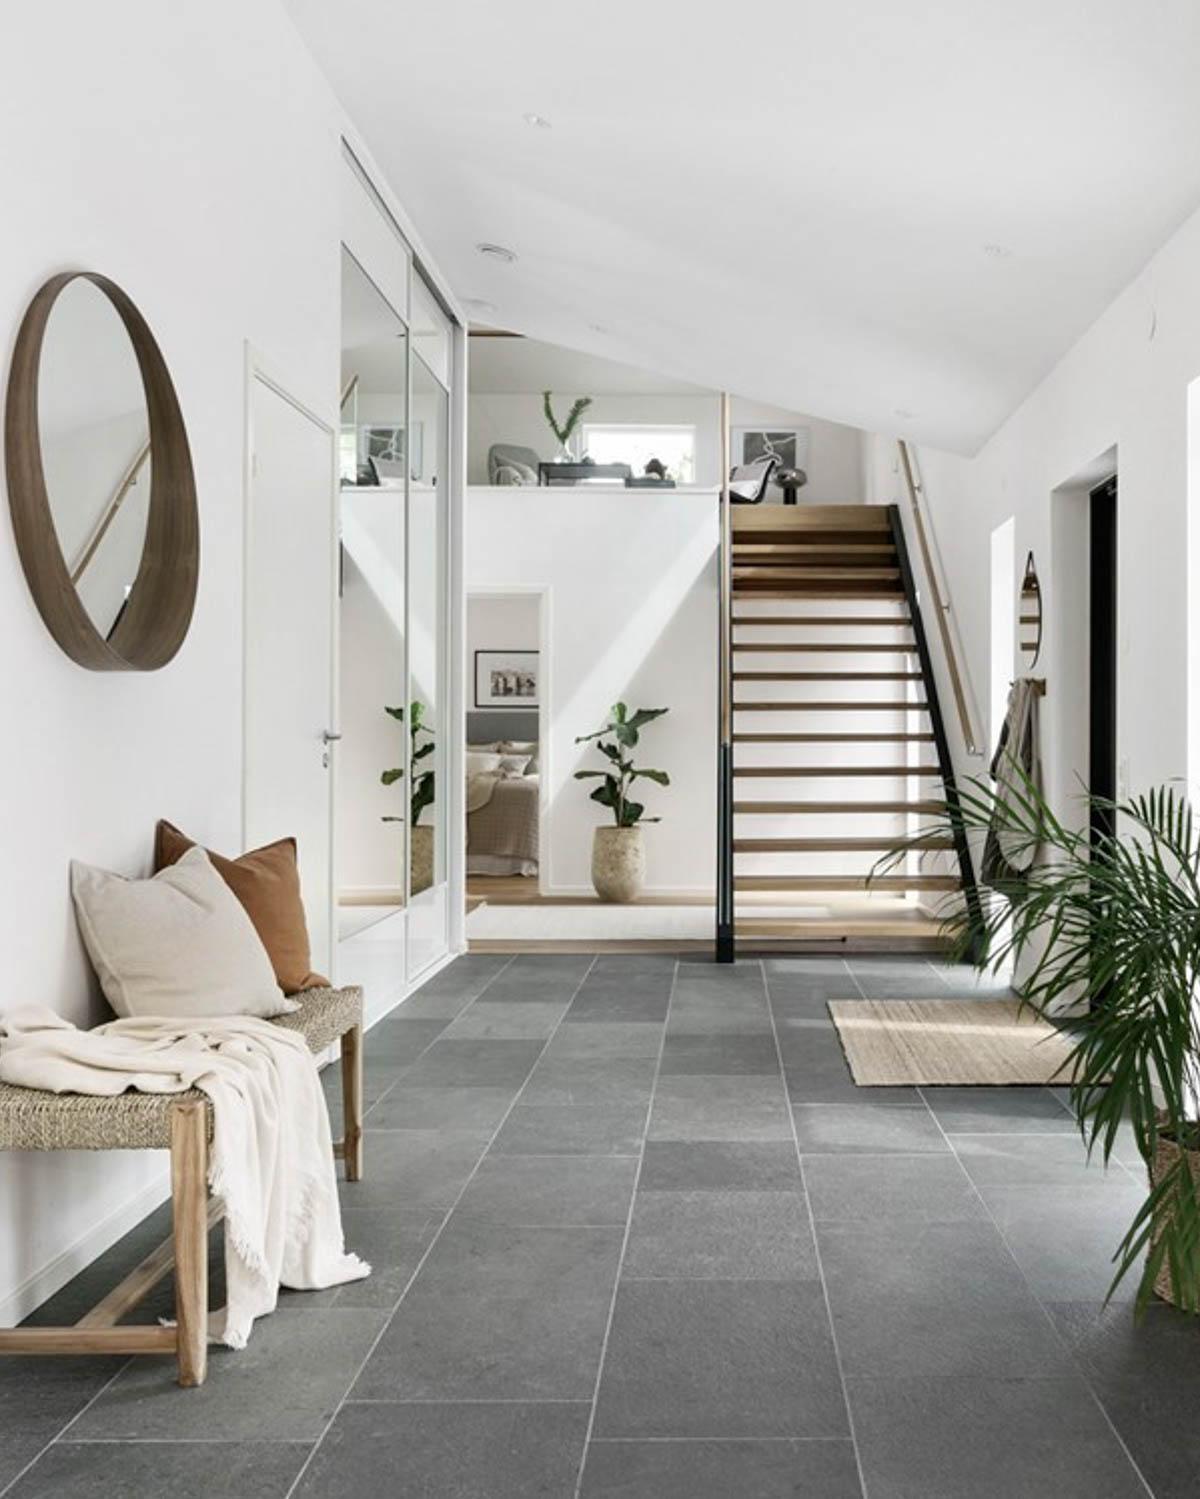 En entré / gang /hall som er belagt med grå fliser i skifer fra Offerdal- Huset har en typisk skandinavisk stil.